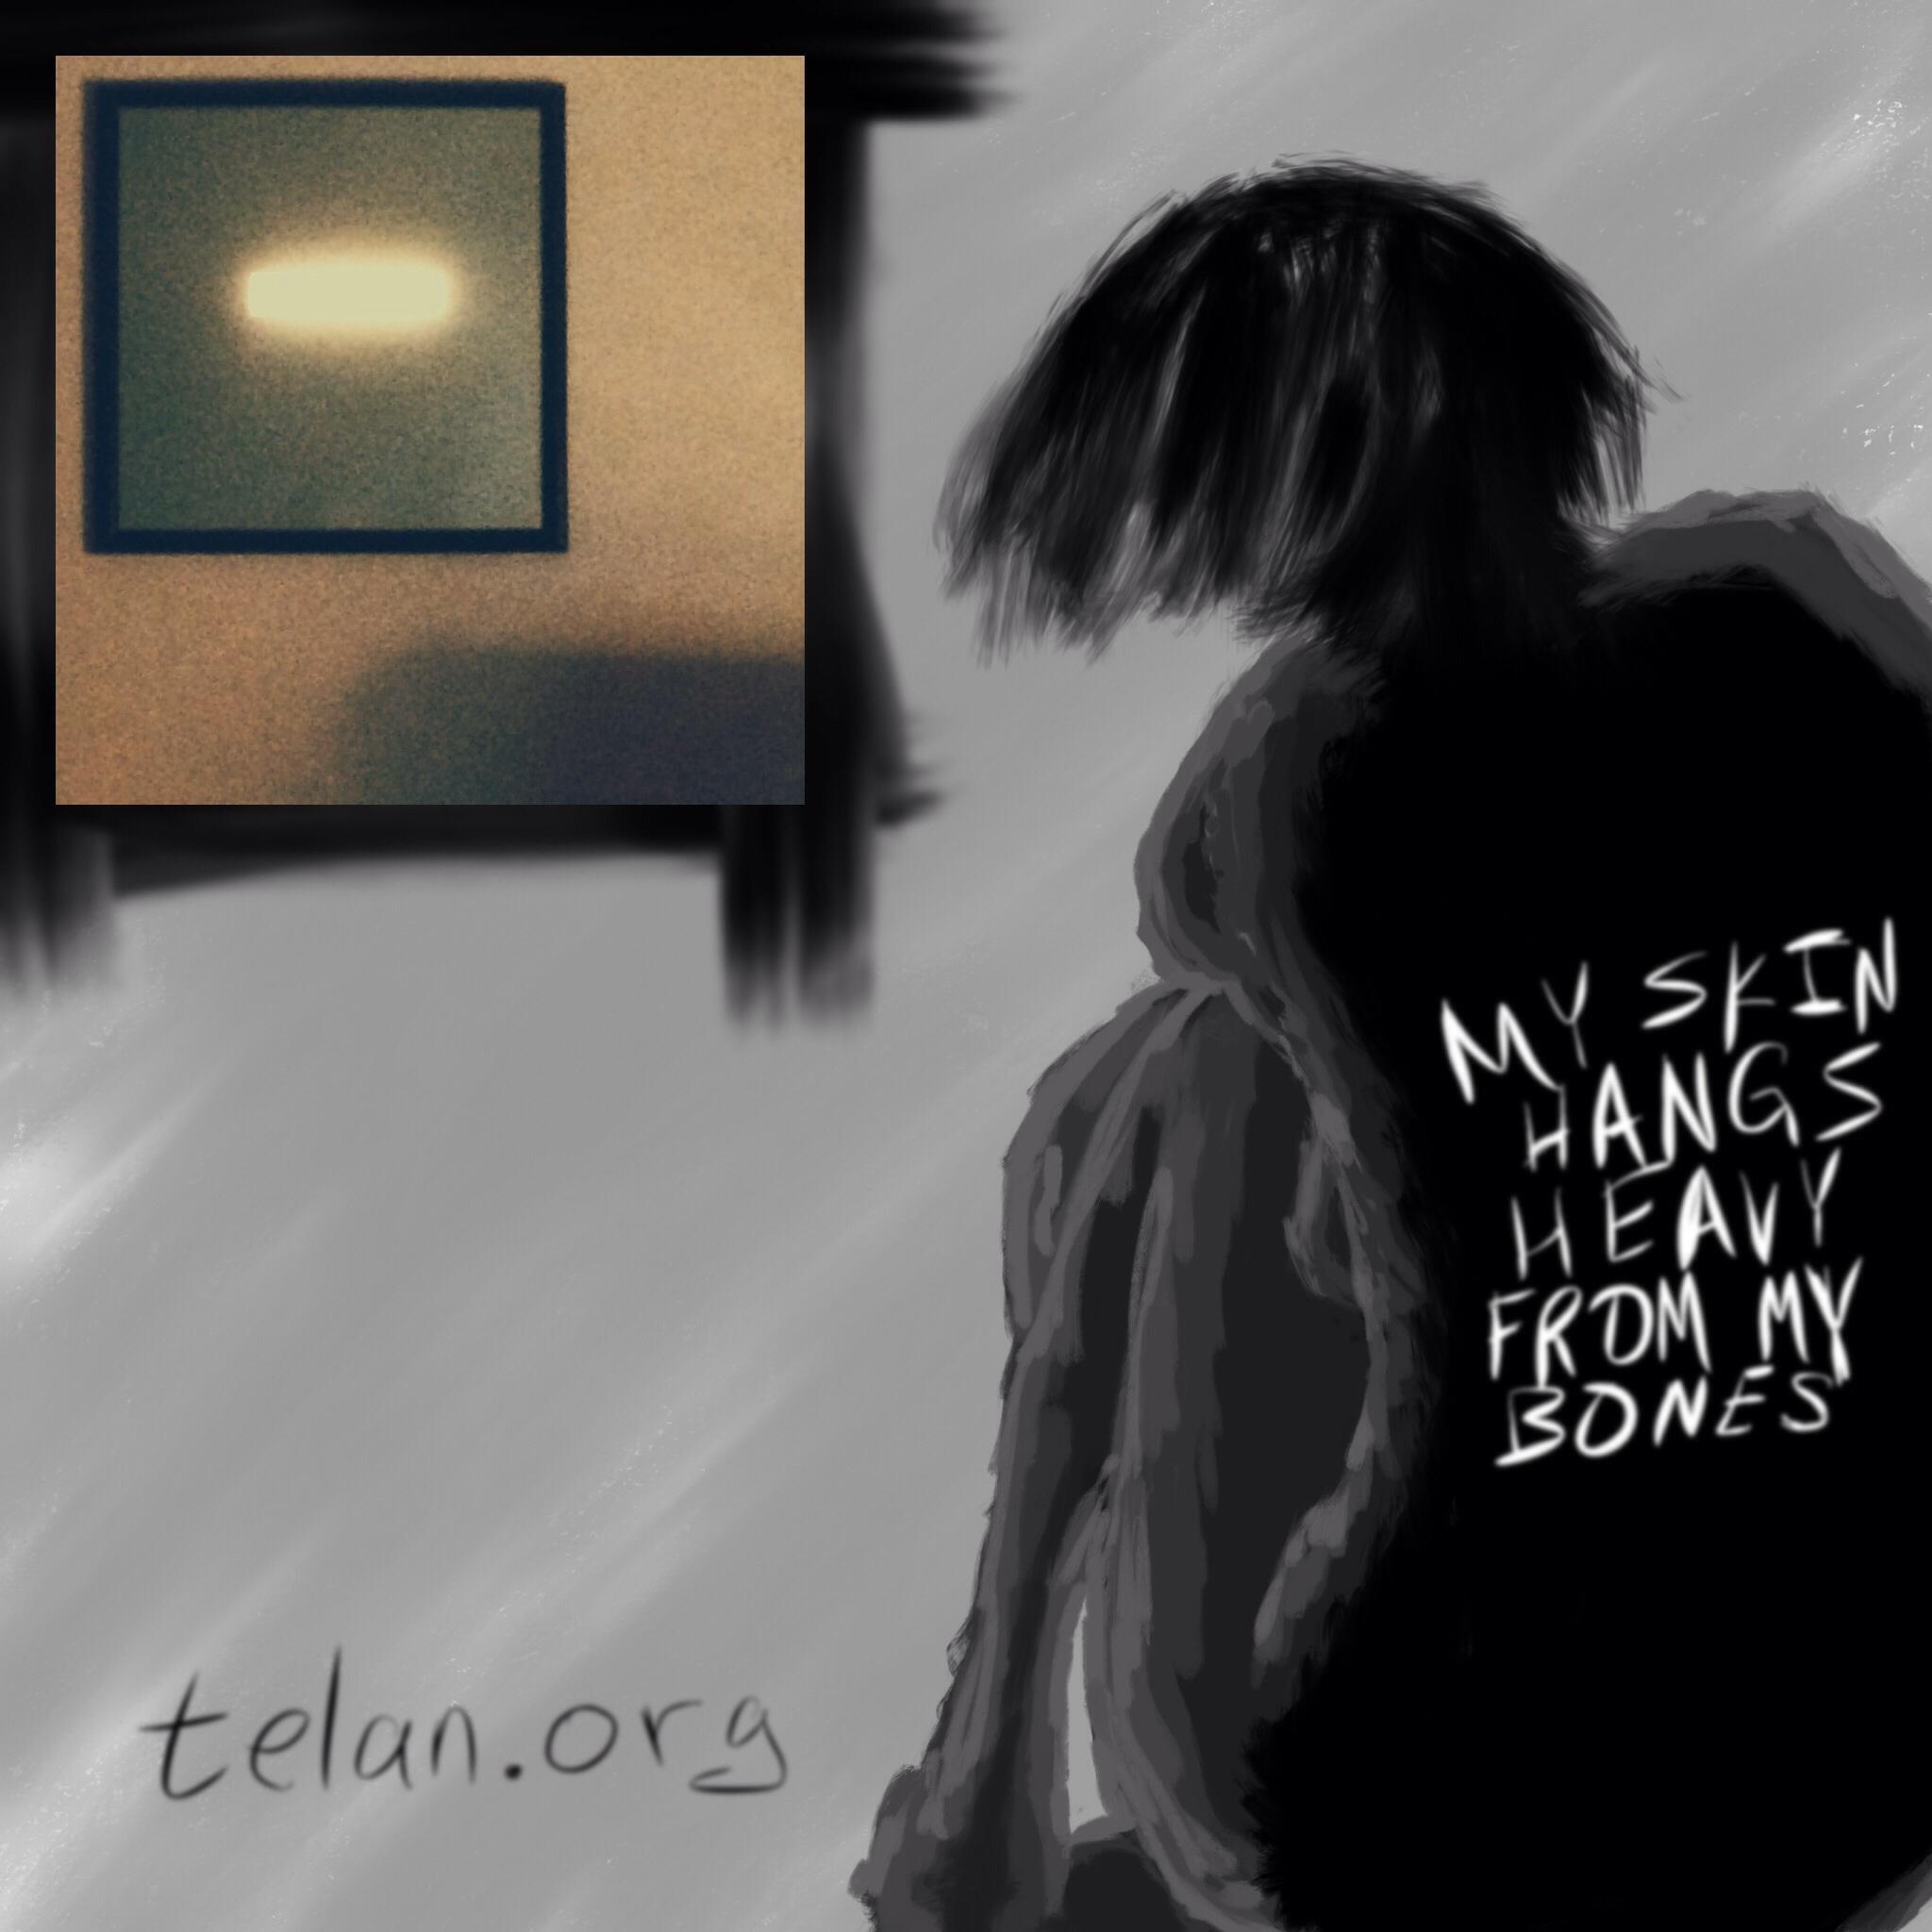 My skin hangs heavy from my bones.